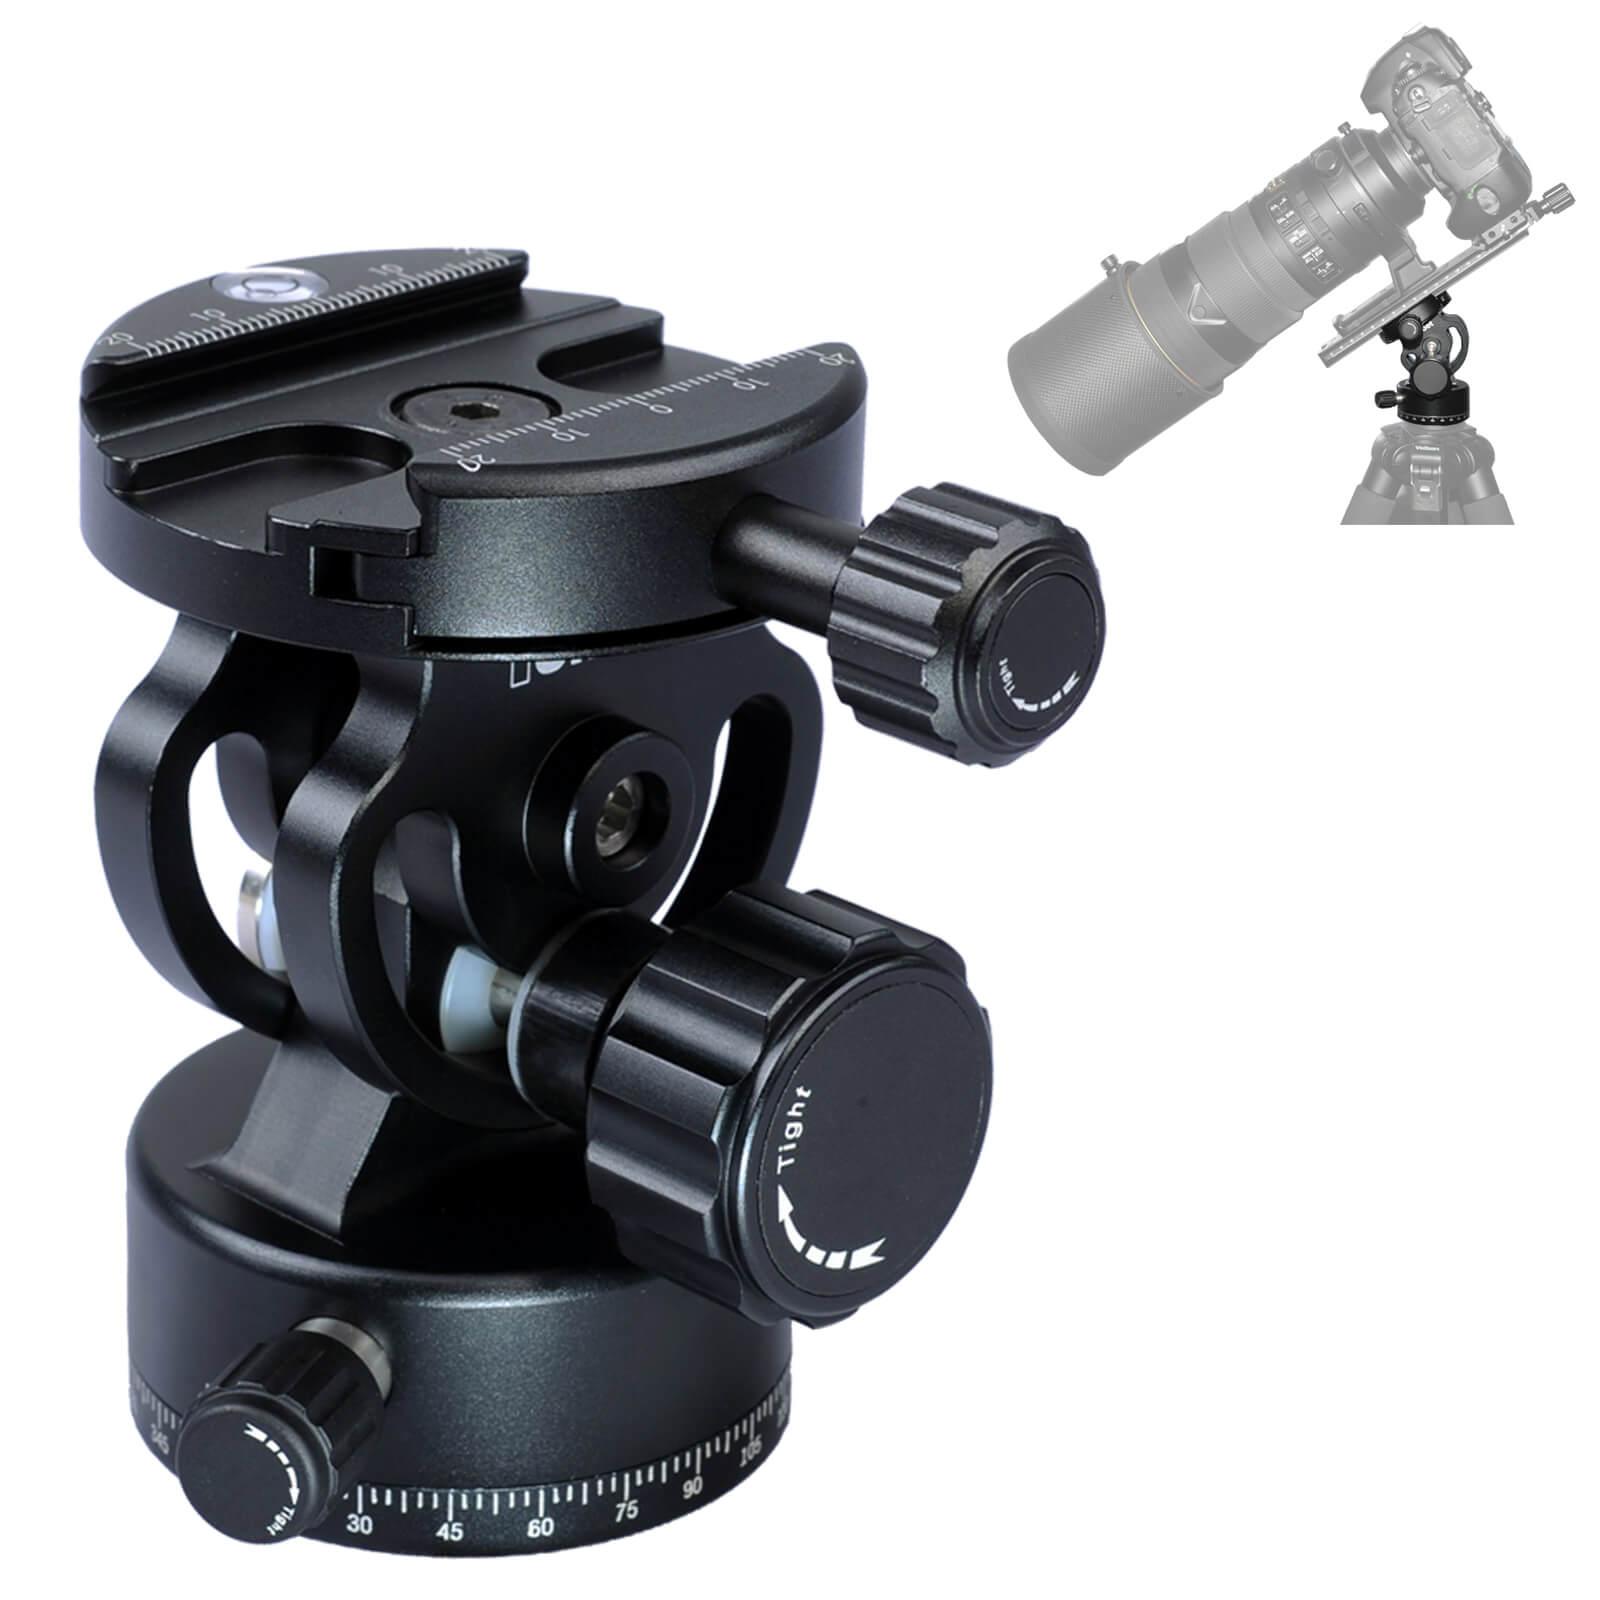 IShoot All-metal 2D 360 Panning panorámico abrazadera cabeza de bola para Arca Fit cámara de liberación rápida placa trípode Monopod